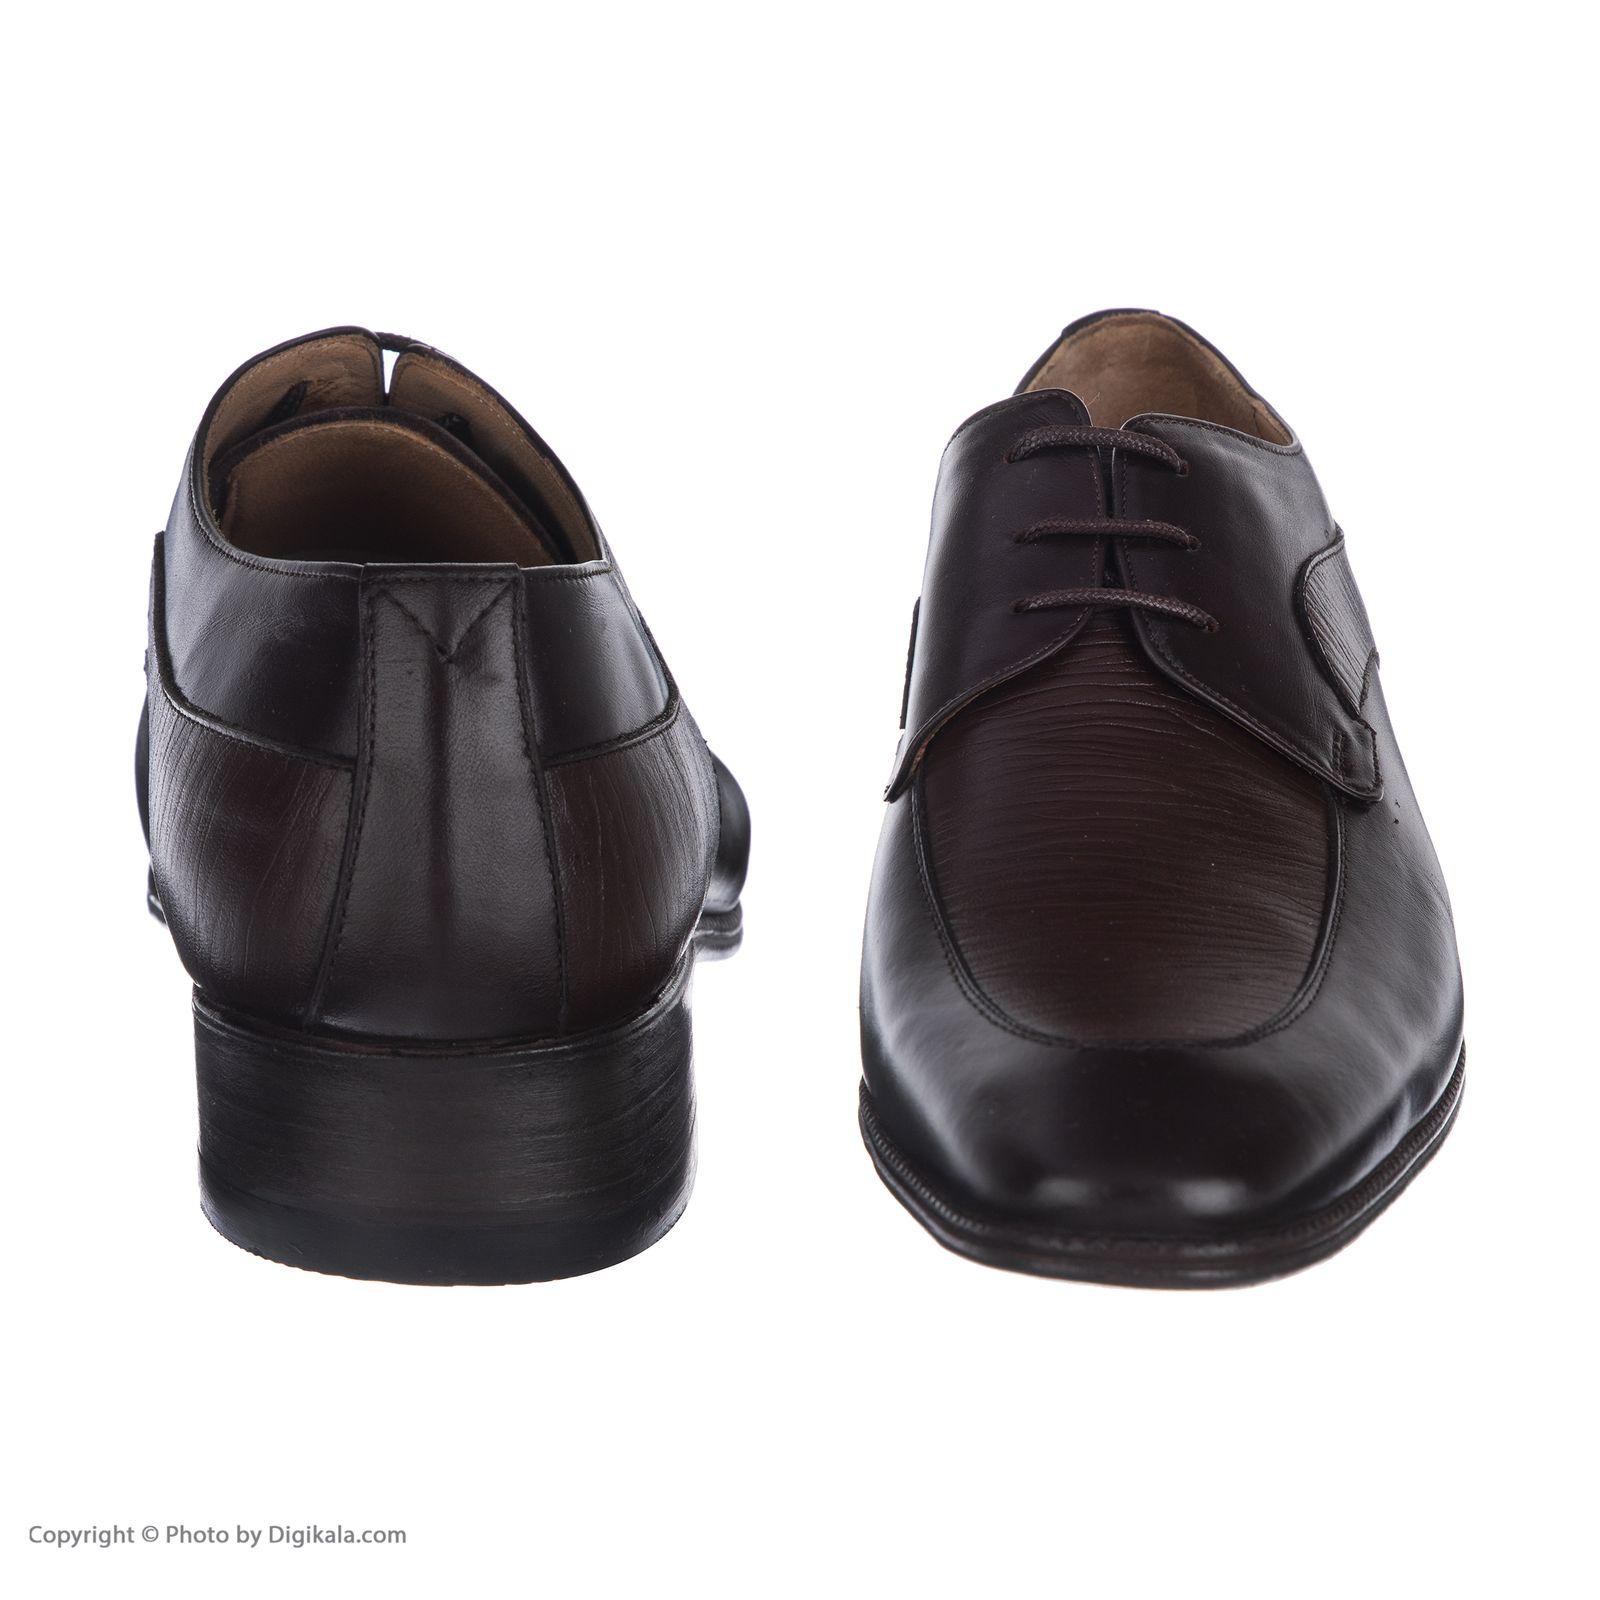 کفش مردانه نظری کد 429 -  - 3